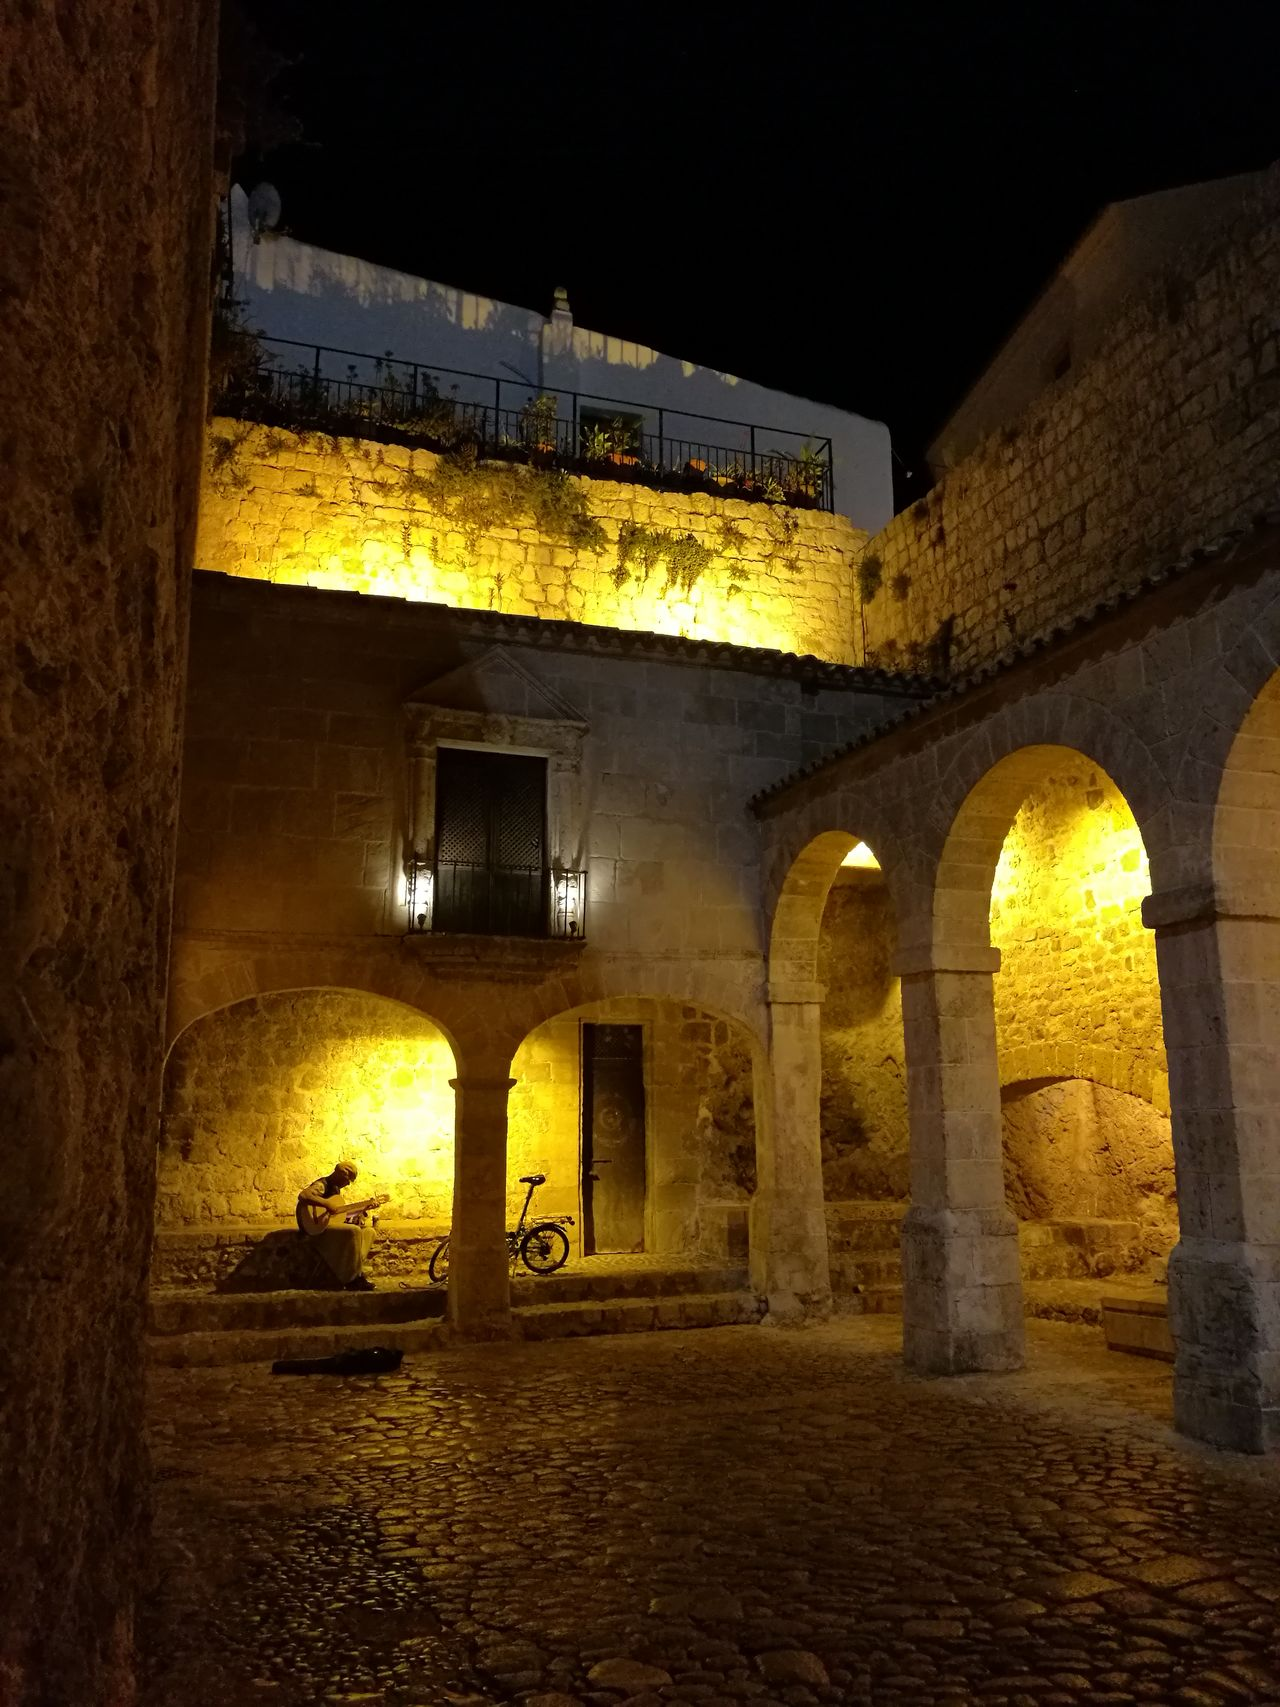 Cities At Night P9smartphone Leicacamera First Eyeem Photo Ibiza IbizabyNight Historic Site